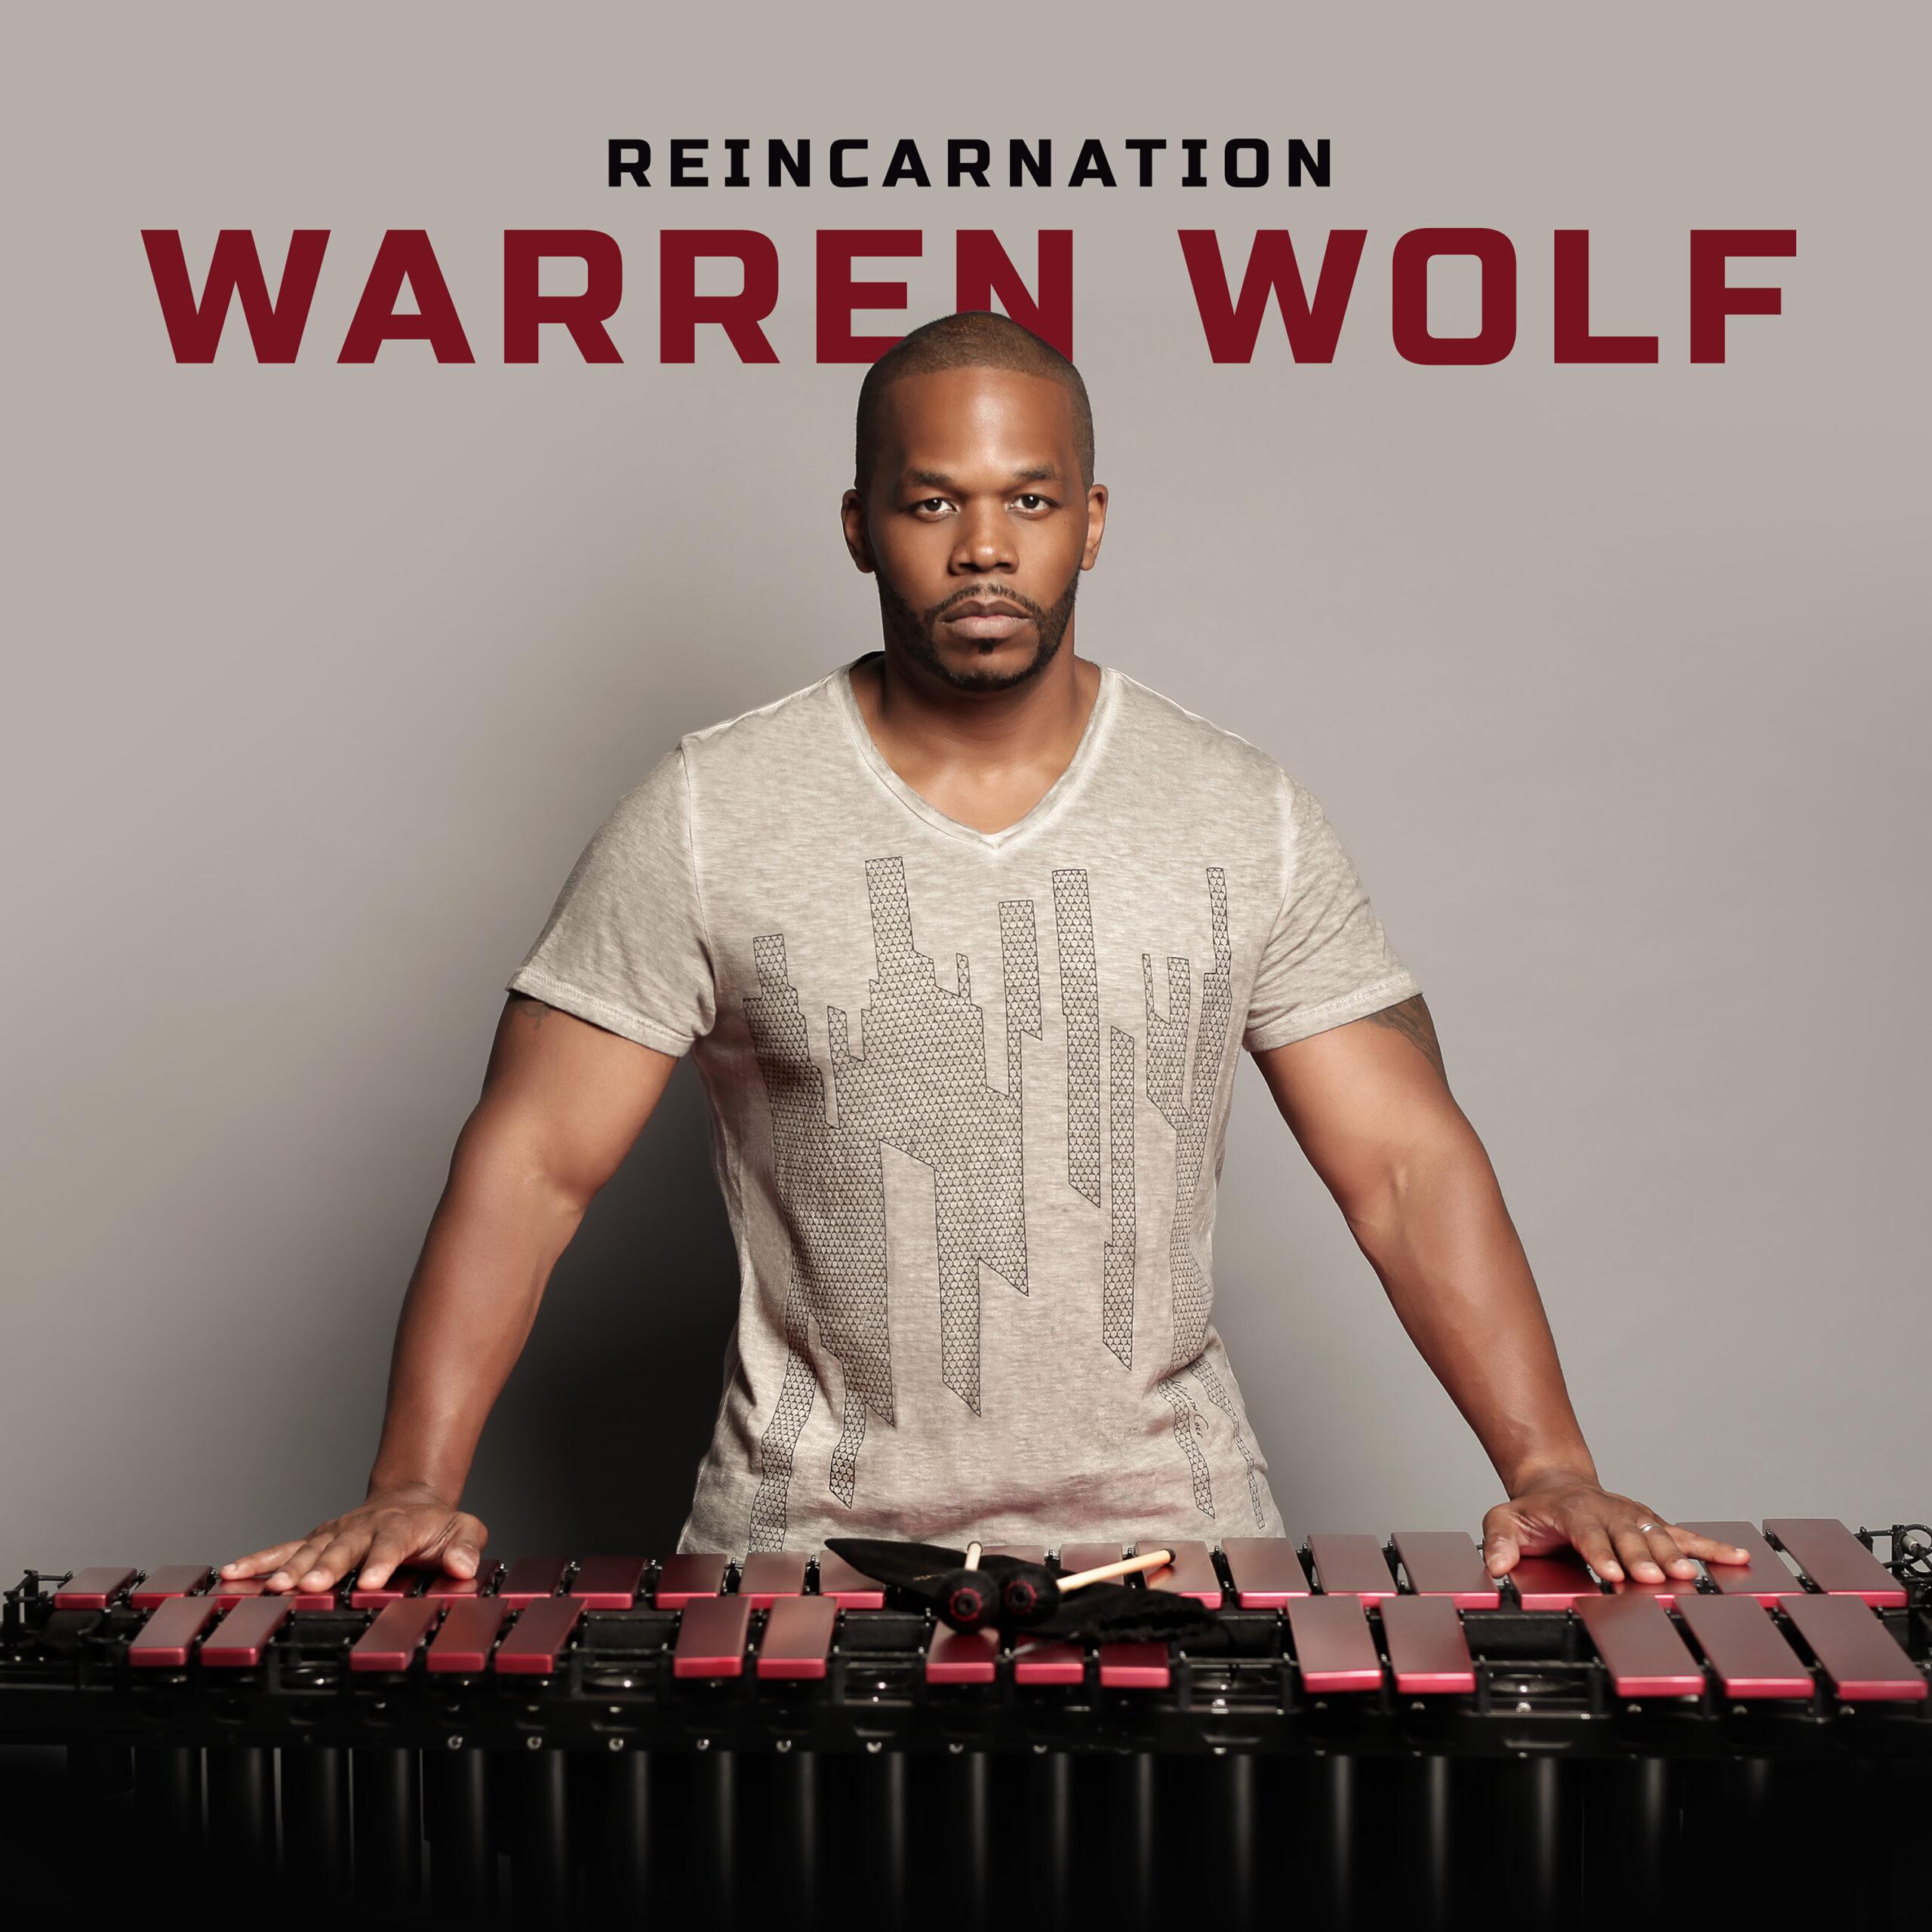 mac_1169_warren_wolf_reincarnation_cover_3000x3000_rgb